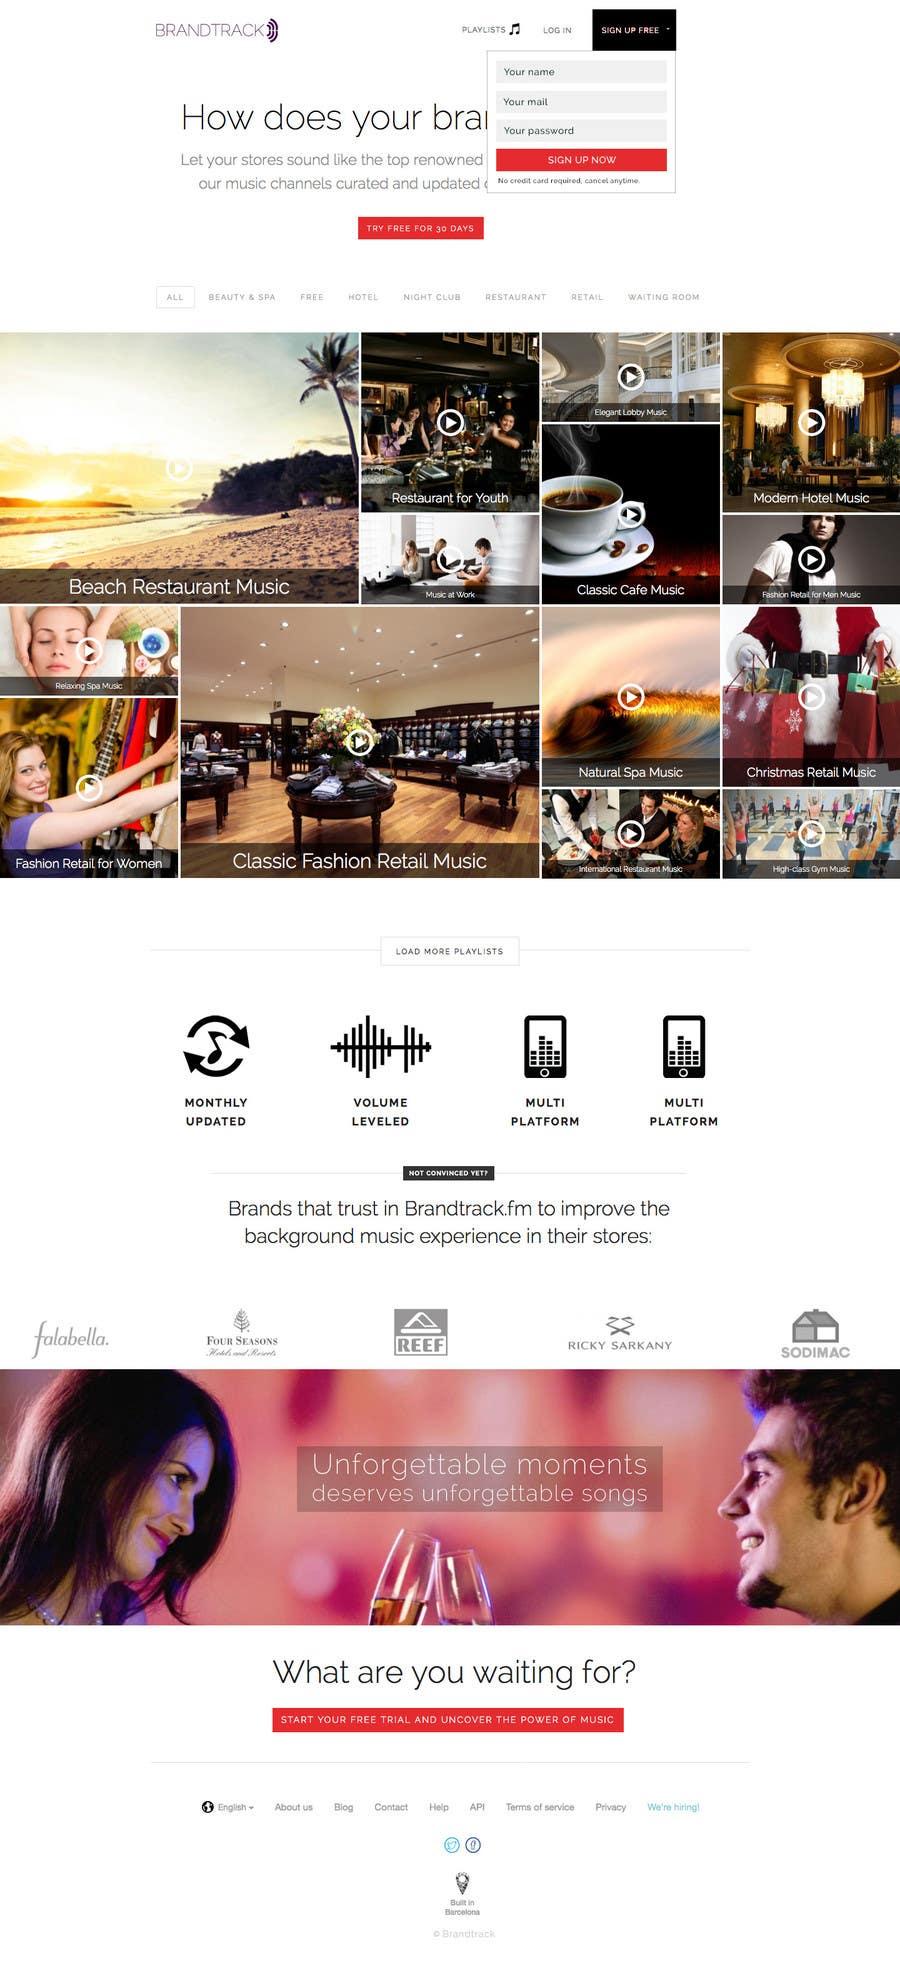 Penyertaan Peraduan #20 untuk Improve the Design of a wordpress theme for a Music Website